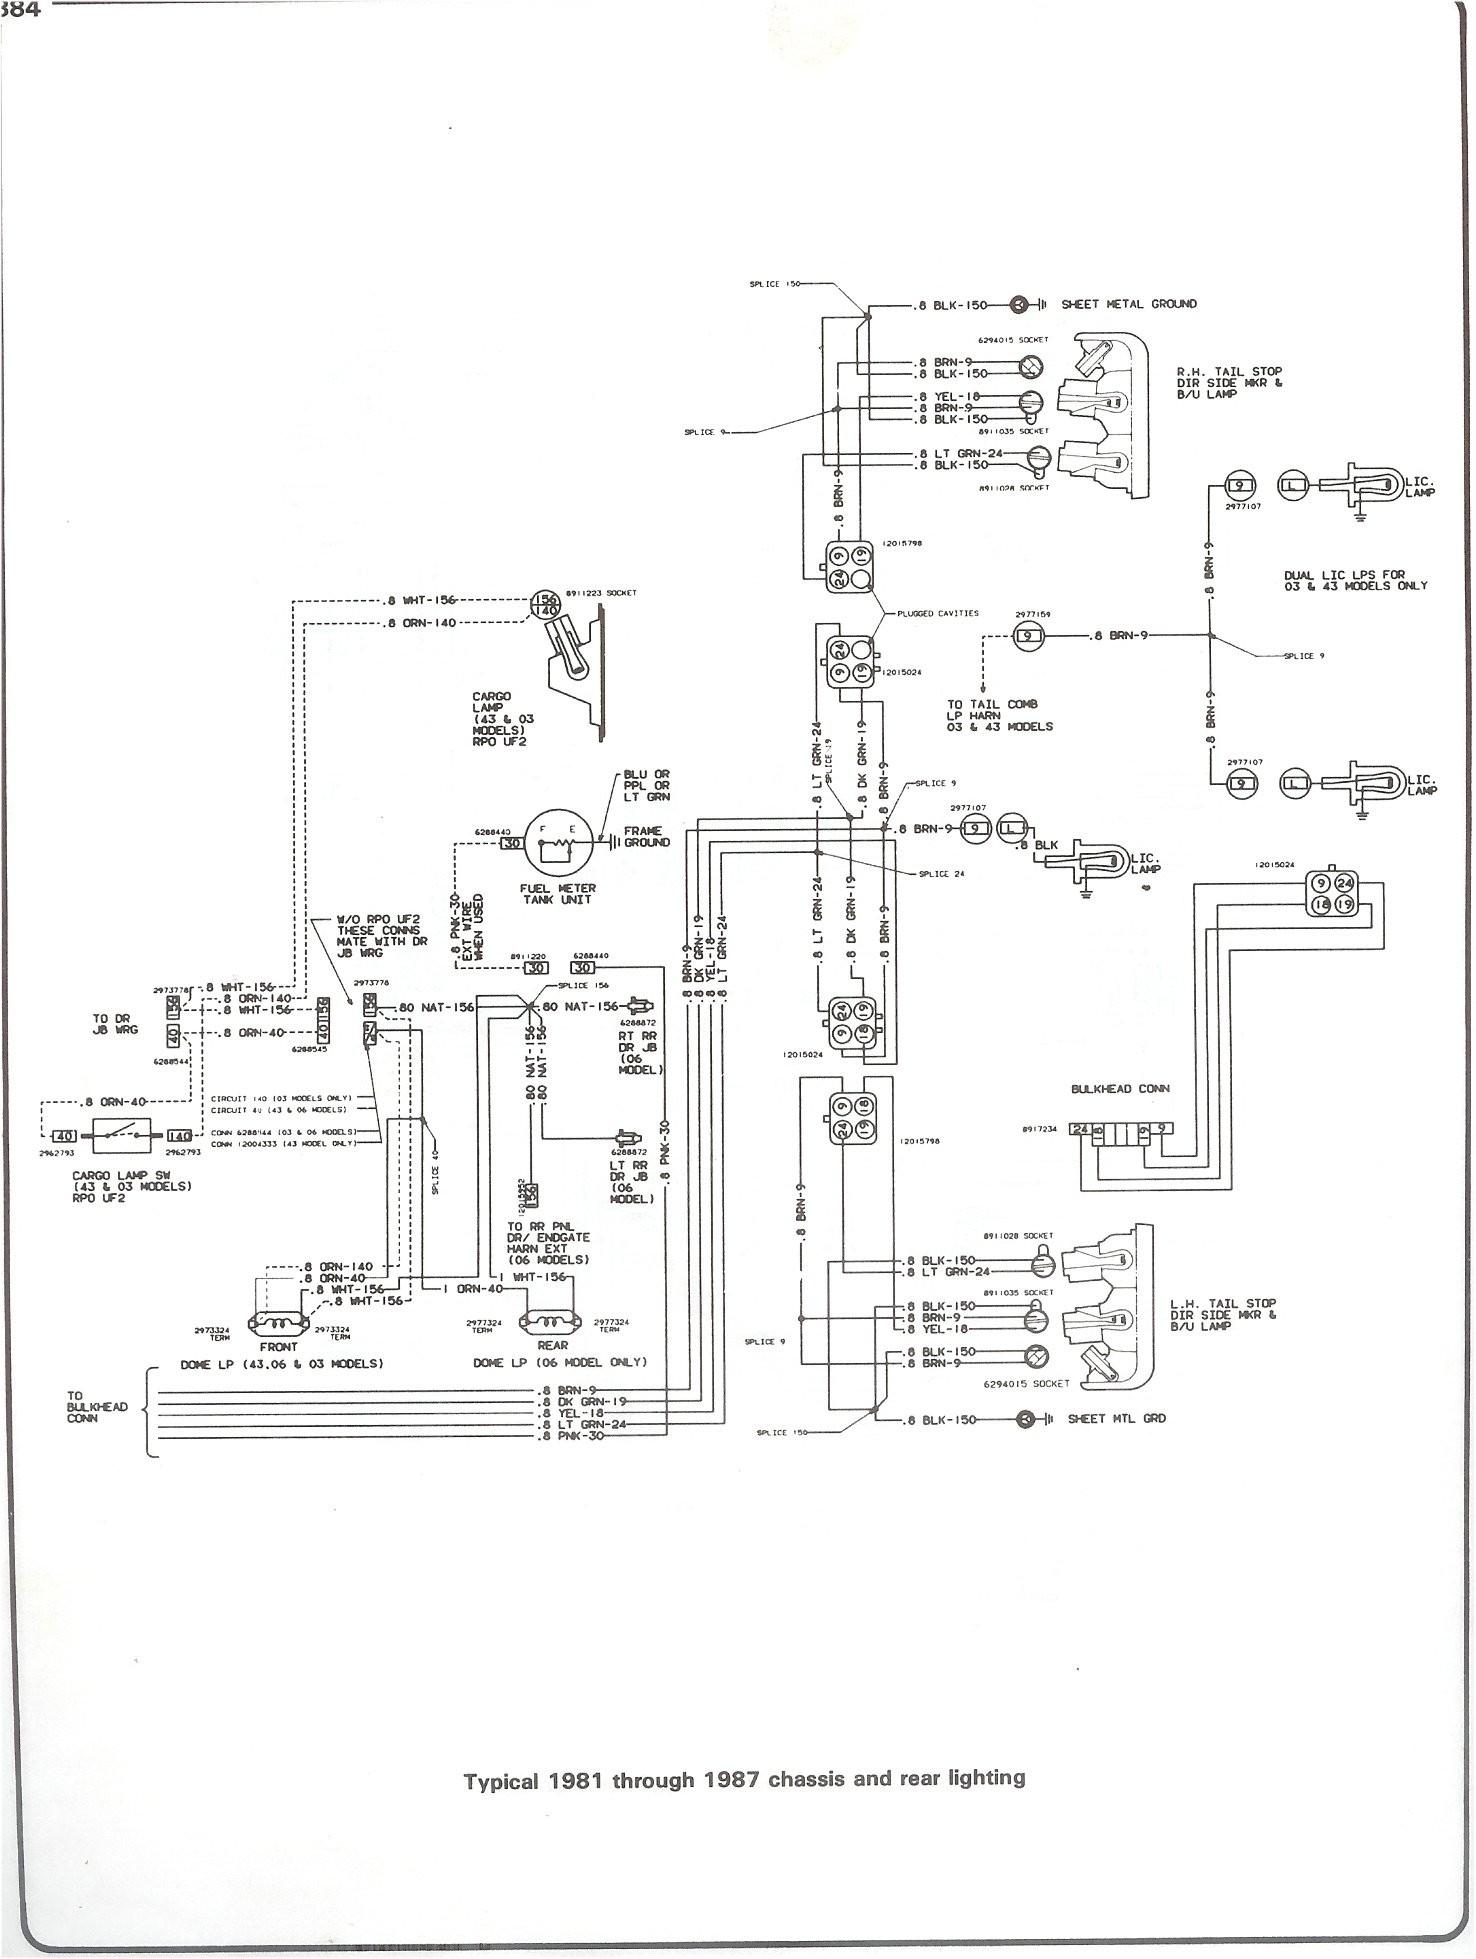 1987 chevy truck wiring diagram